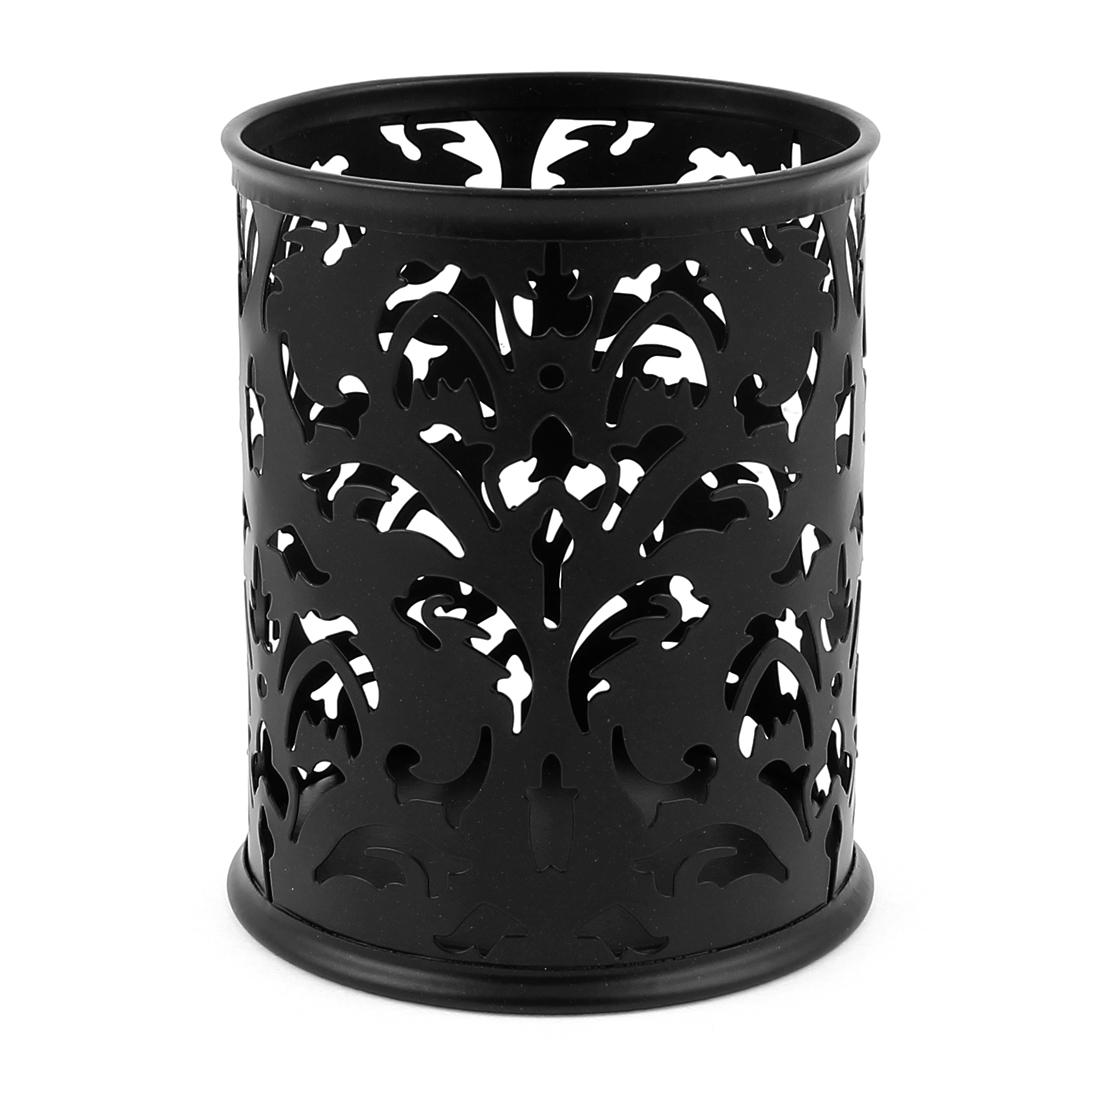 Hollow Flower Design Cylinder Pen Pencil Pot Holder Container Organizer Black